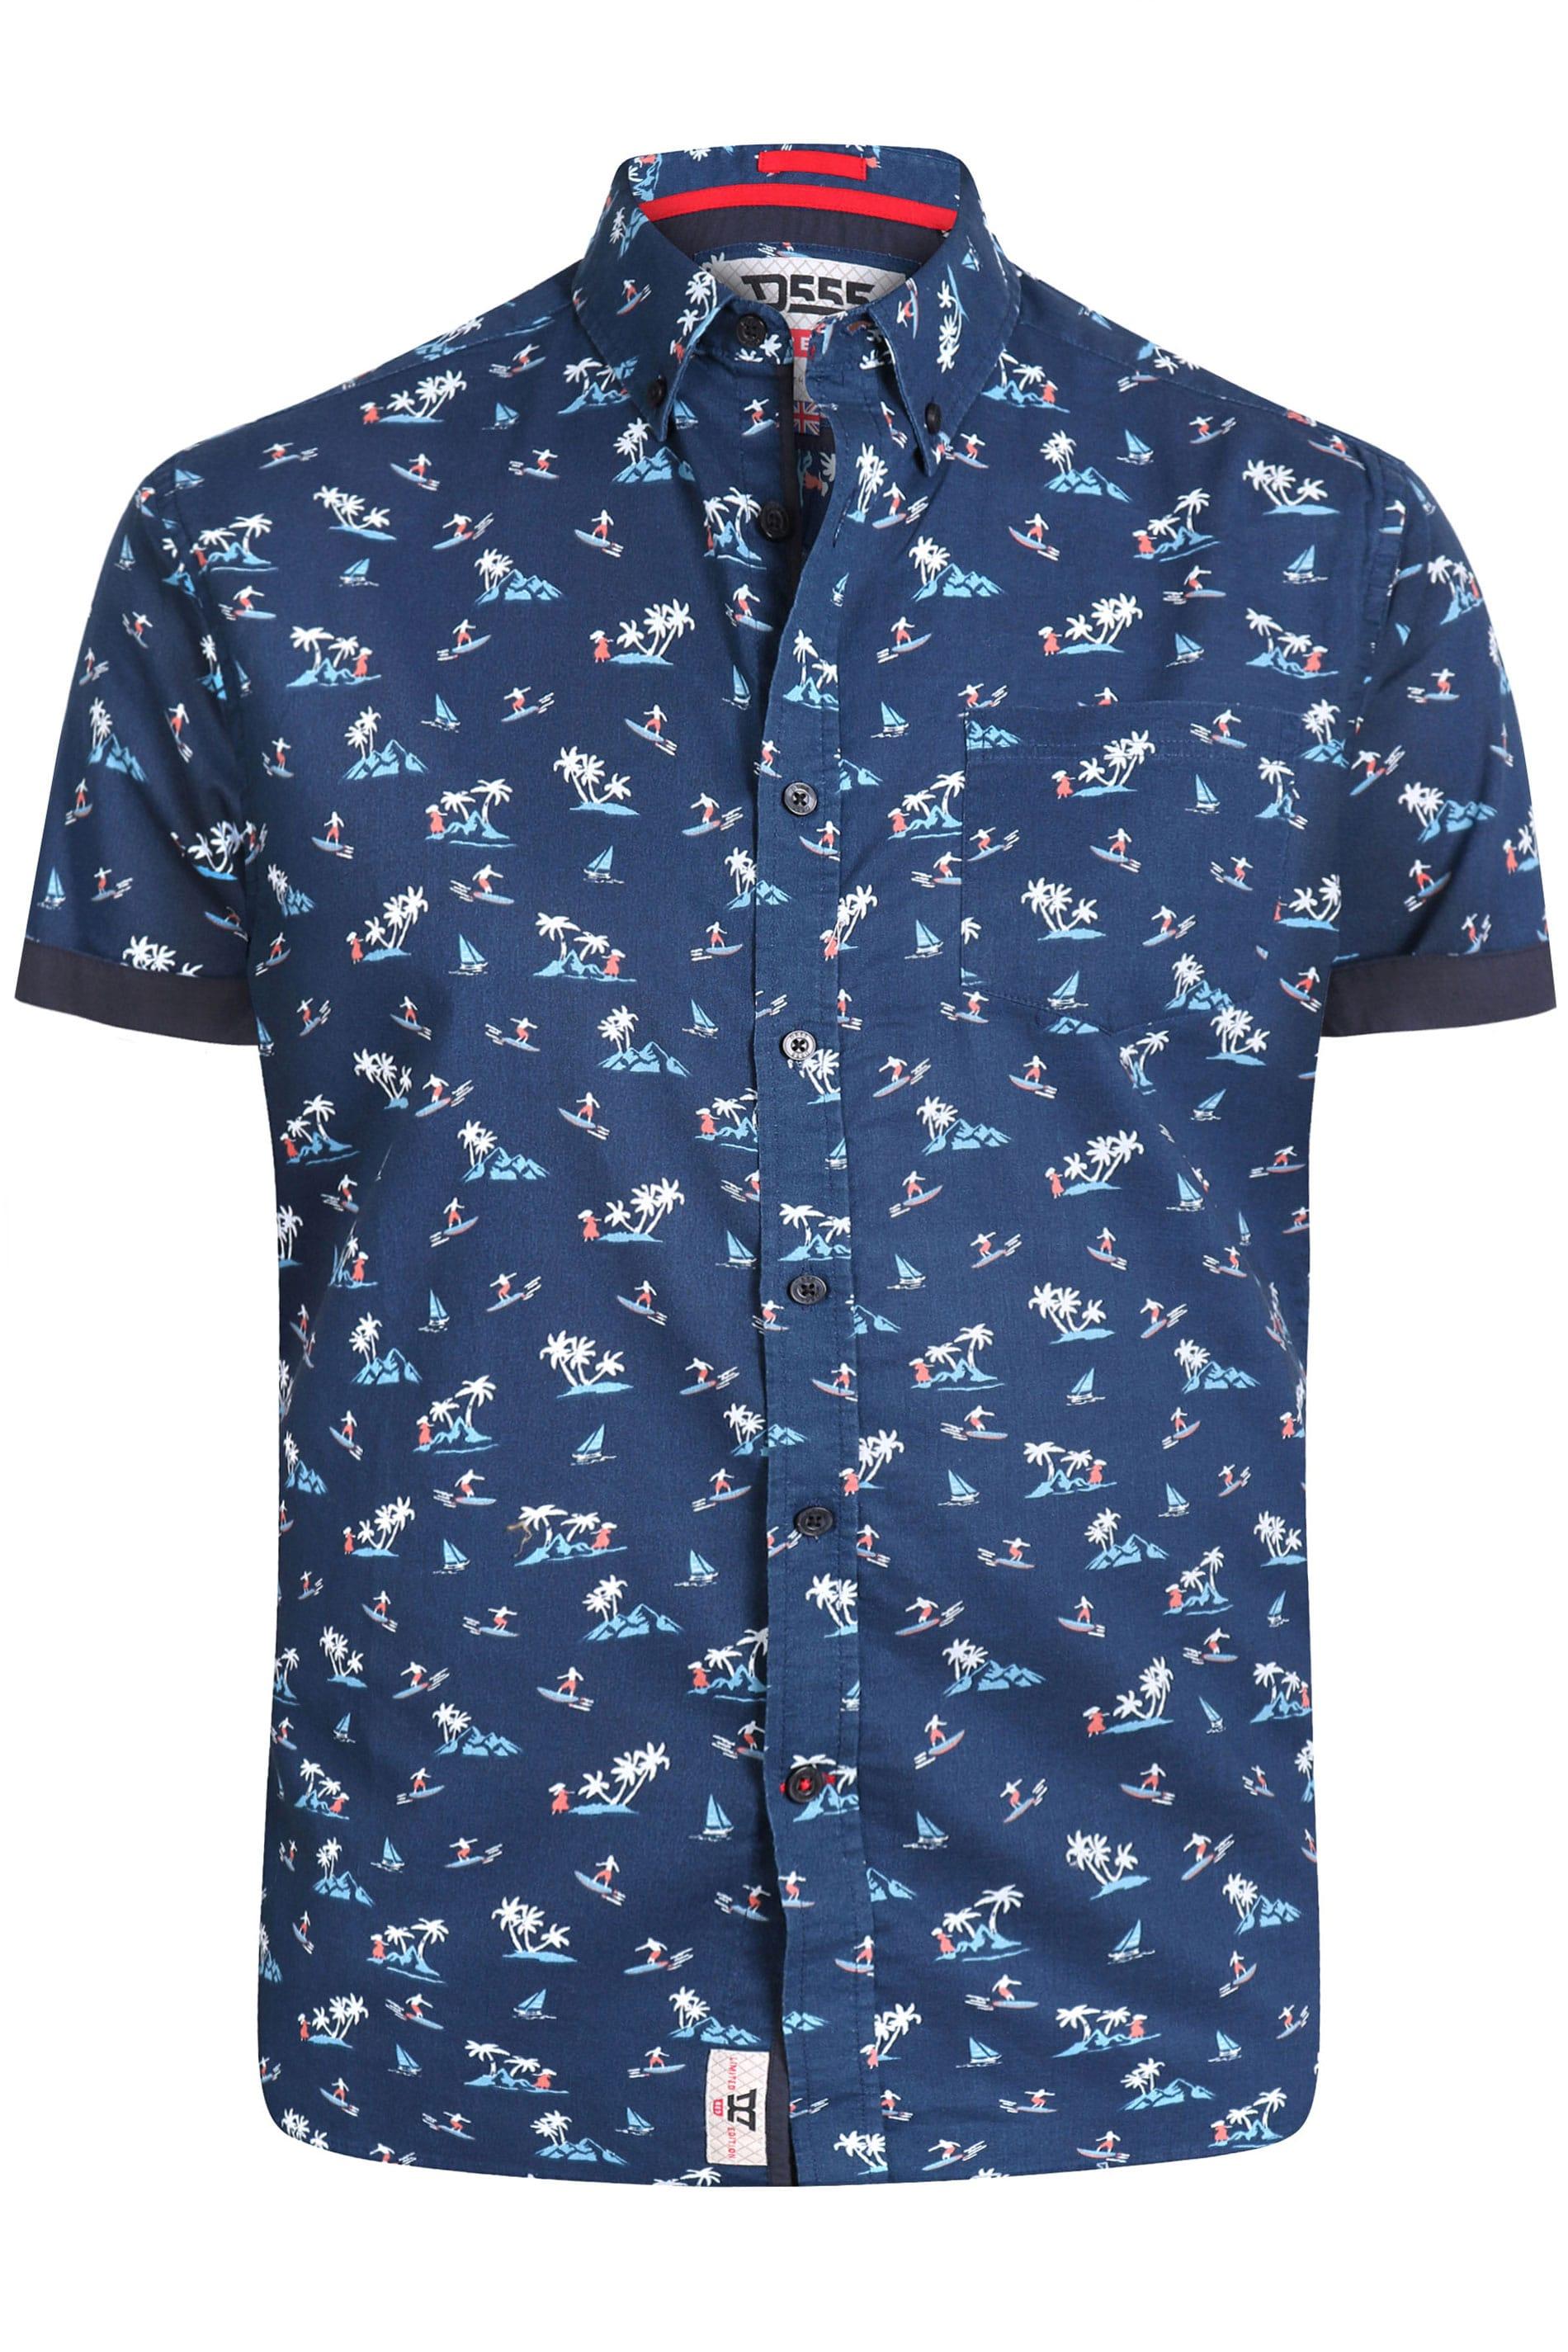 D555 Navy Hawaiian Surf Print Shirt